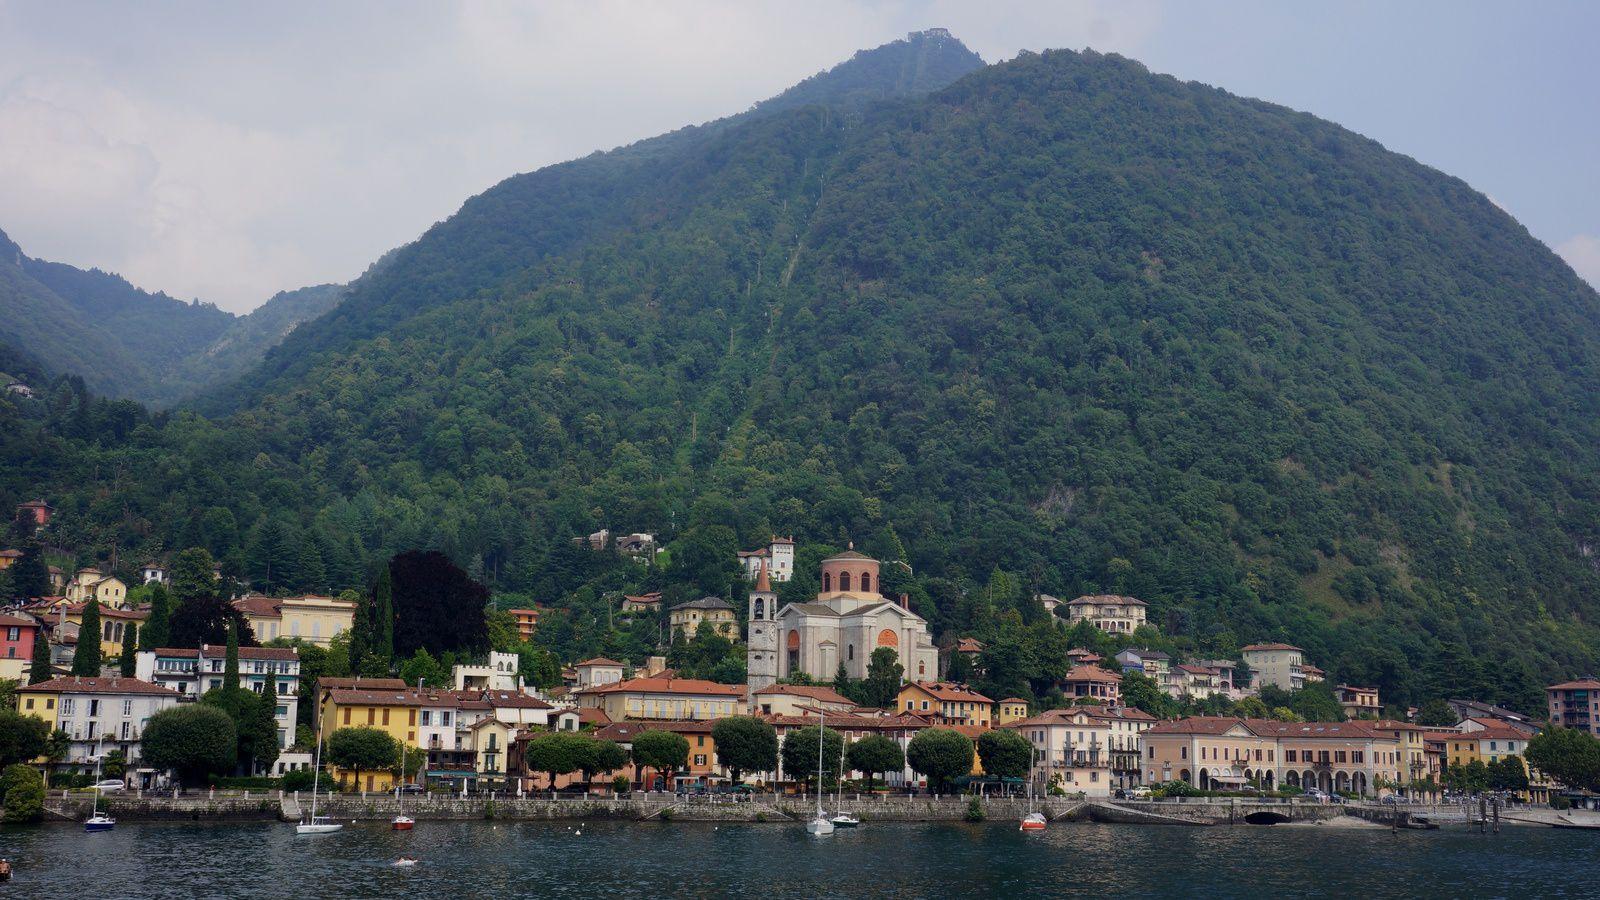 Autour du lac majeur : Les superbes îles de Verbania, Bellagio, Laveno, Verbano, Isola Bella, Isola Madre..